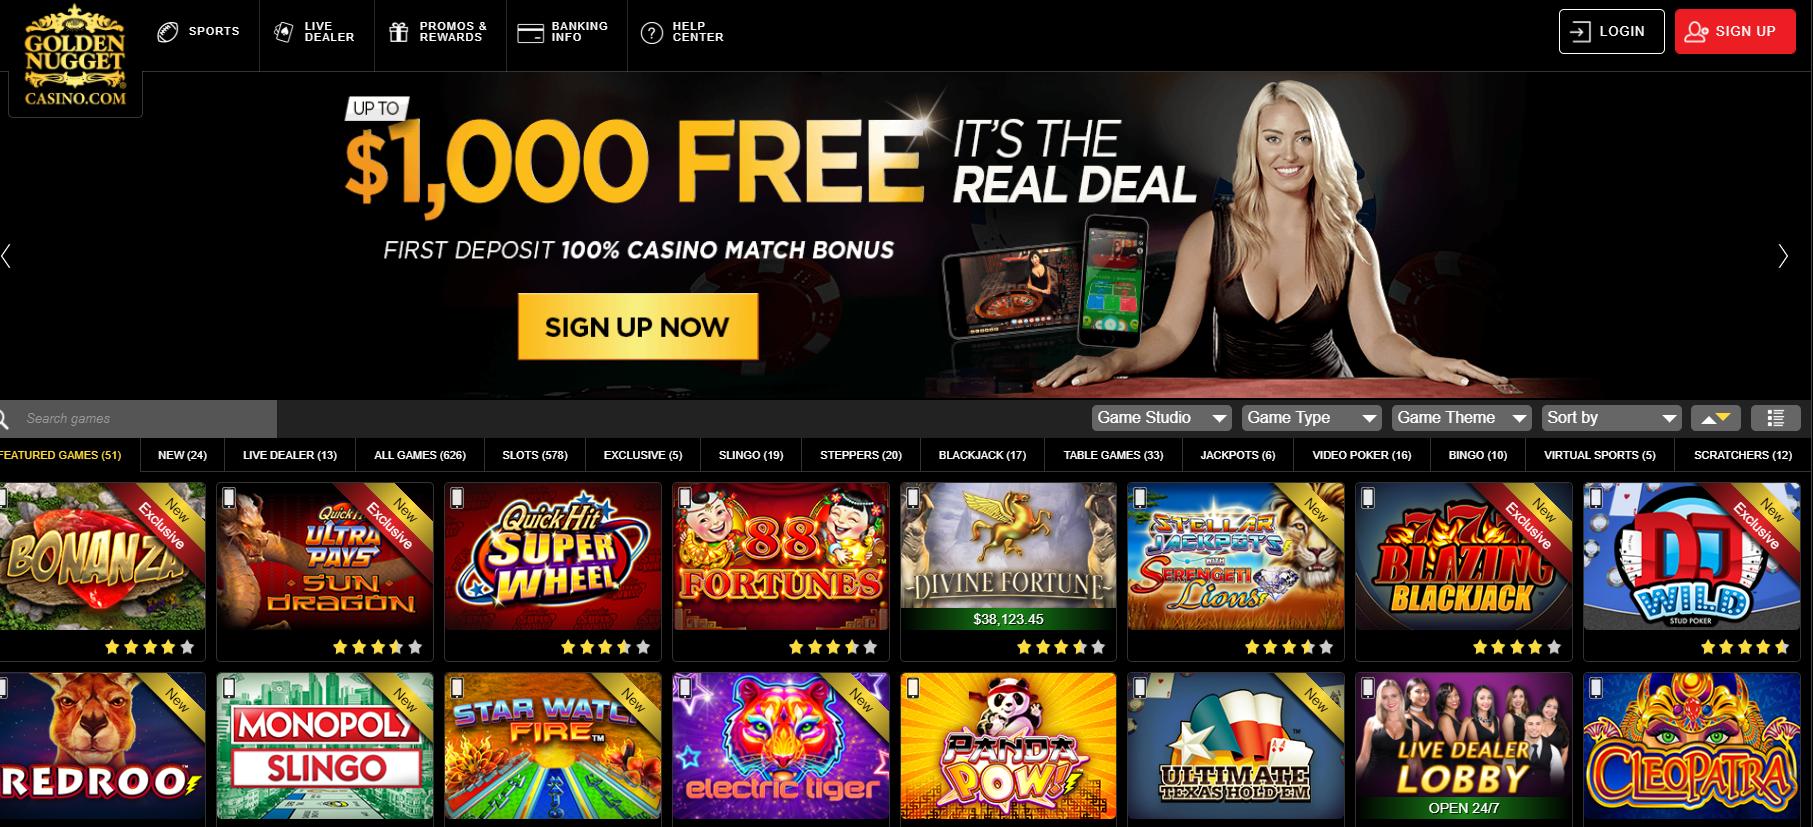 Golden Nugget Online Casino in New Jersey